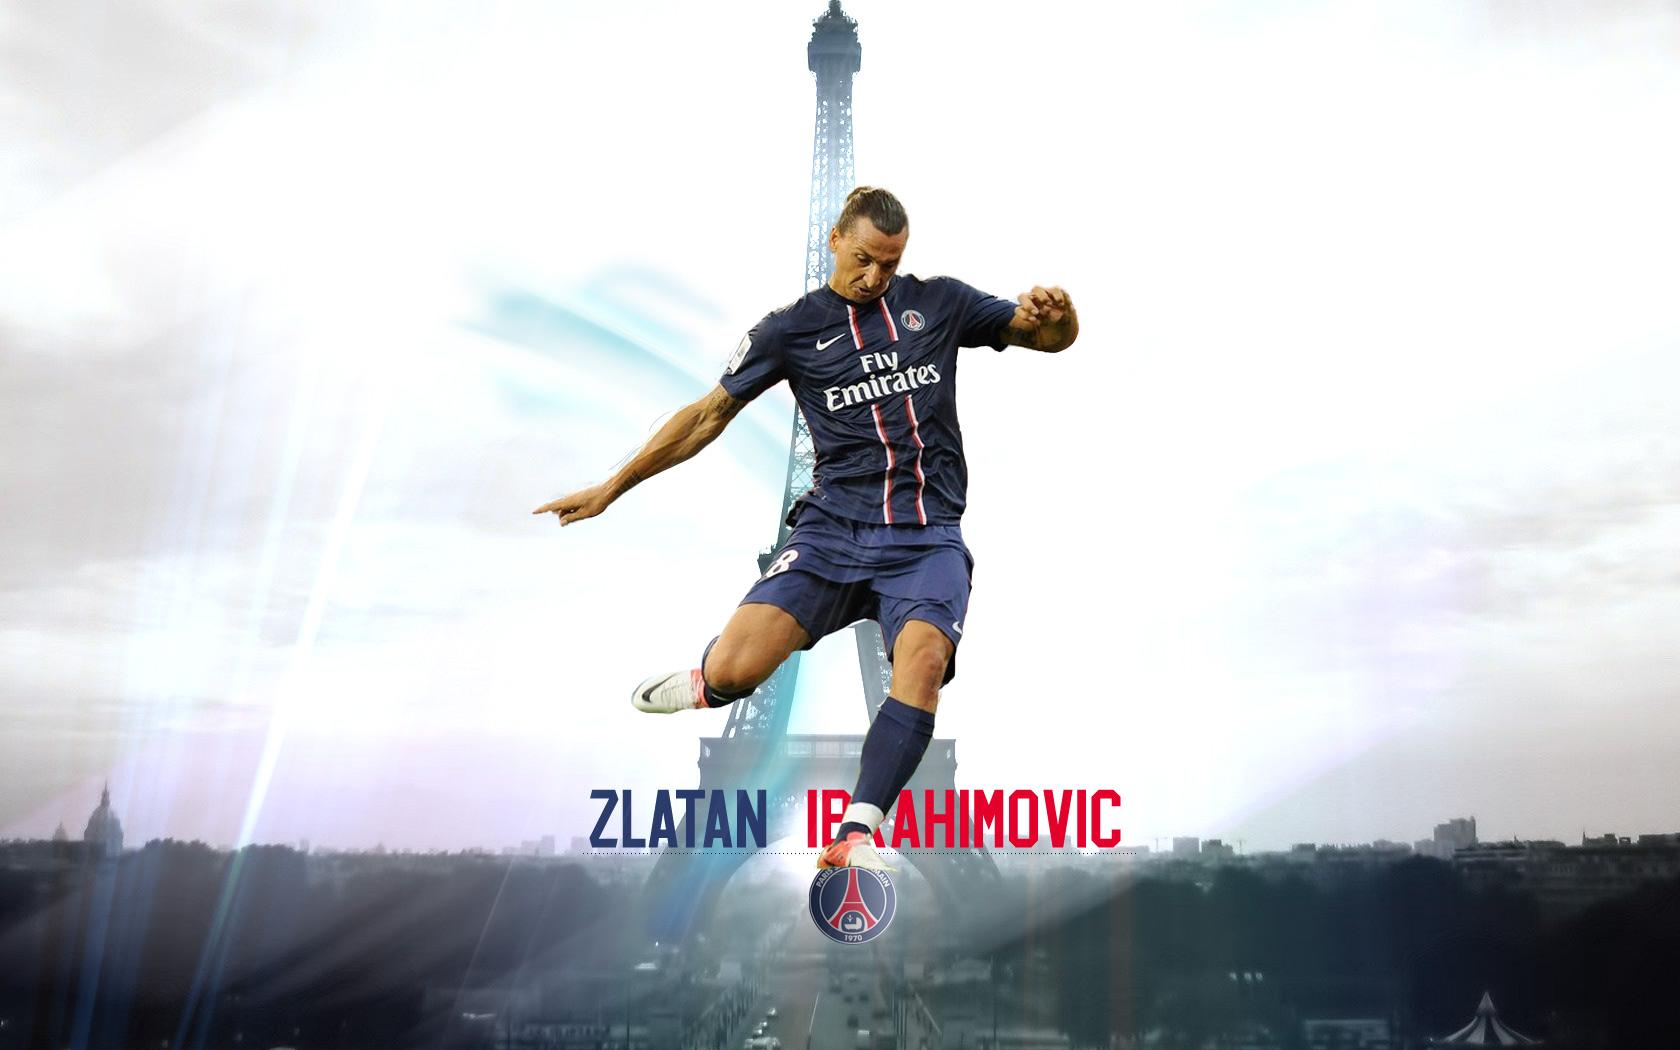 Zlatan Ibrahimovic PSG 2015 Wallpaper HQ Wallpaper WallpaperLepi 1680x1050